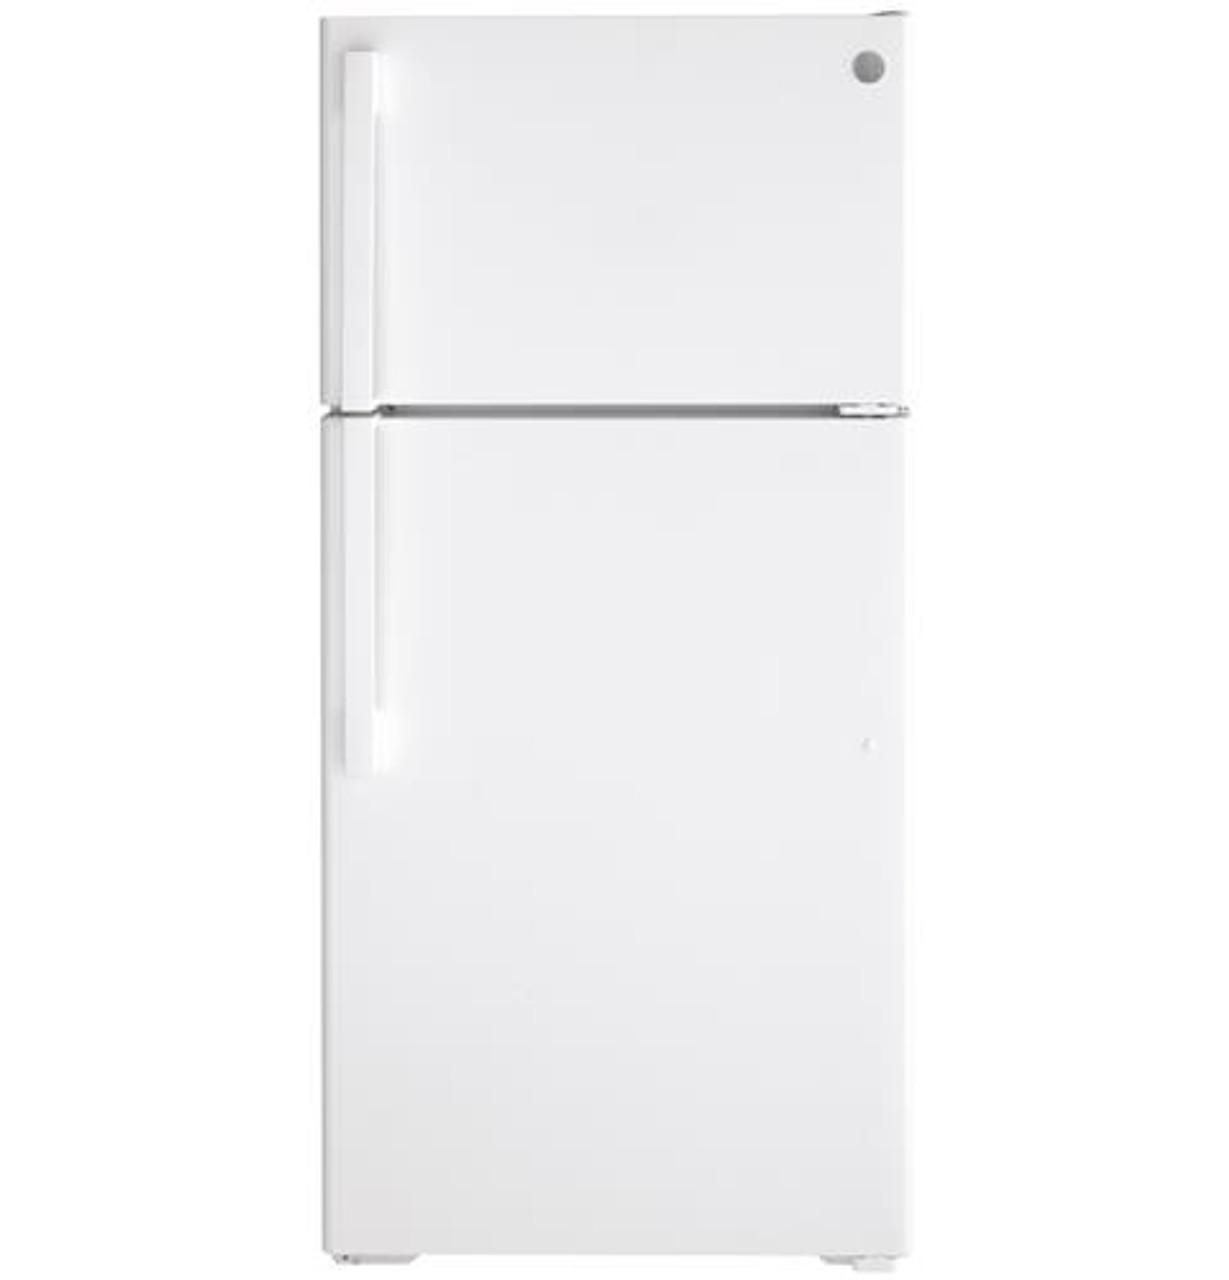 Ge 15 6 Cu Ft Top Freezer Refrigerator Gts16dtnrww Manteo Furniture Appliance